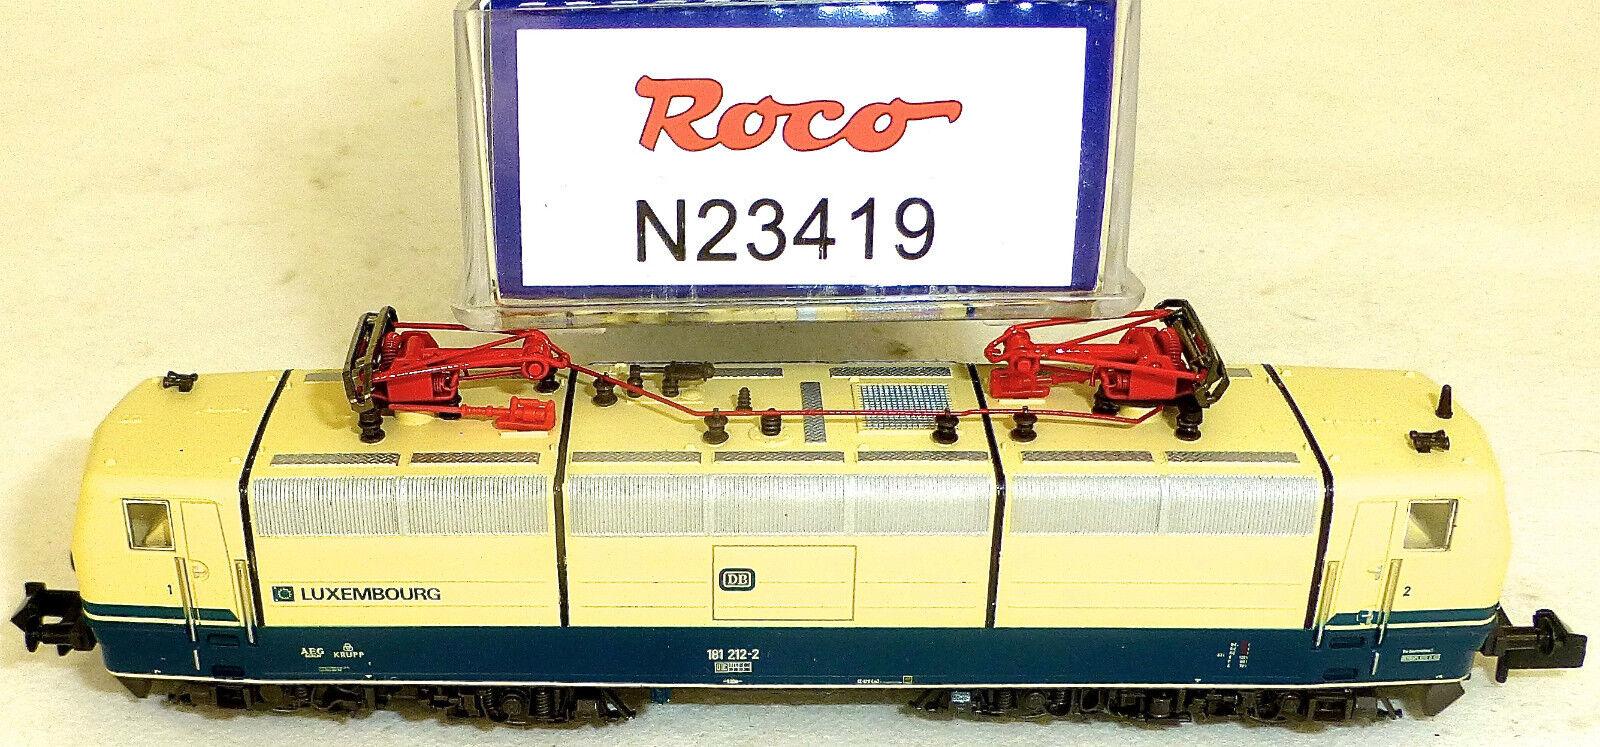 E 181 212 2 electrolok Luxembourg ROCO 23419 N 1:160 OVP NUOVO hq5 µ *